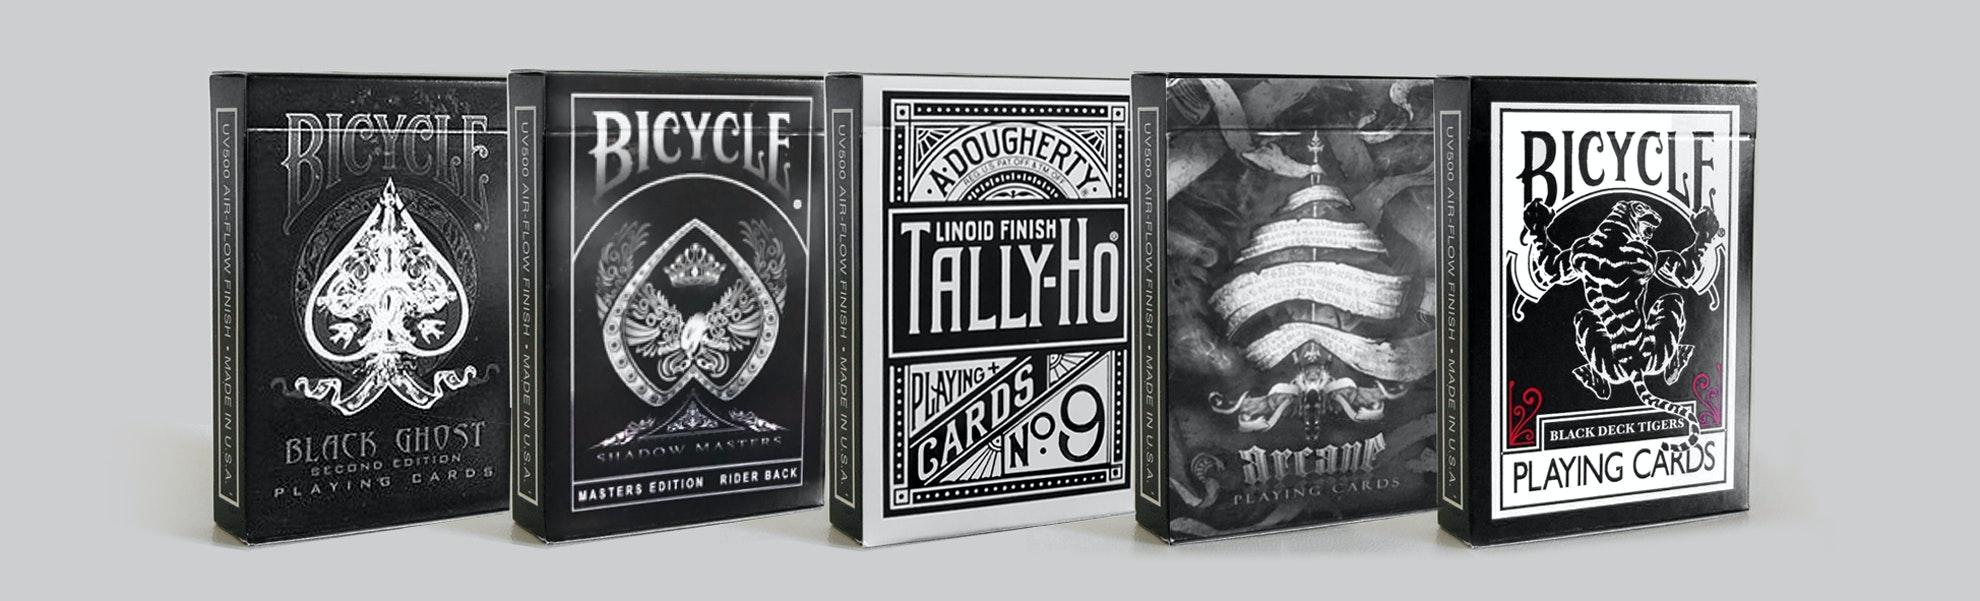 Bicycle All-Black Playing Card Bundle (5-pack)